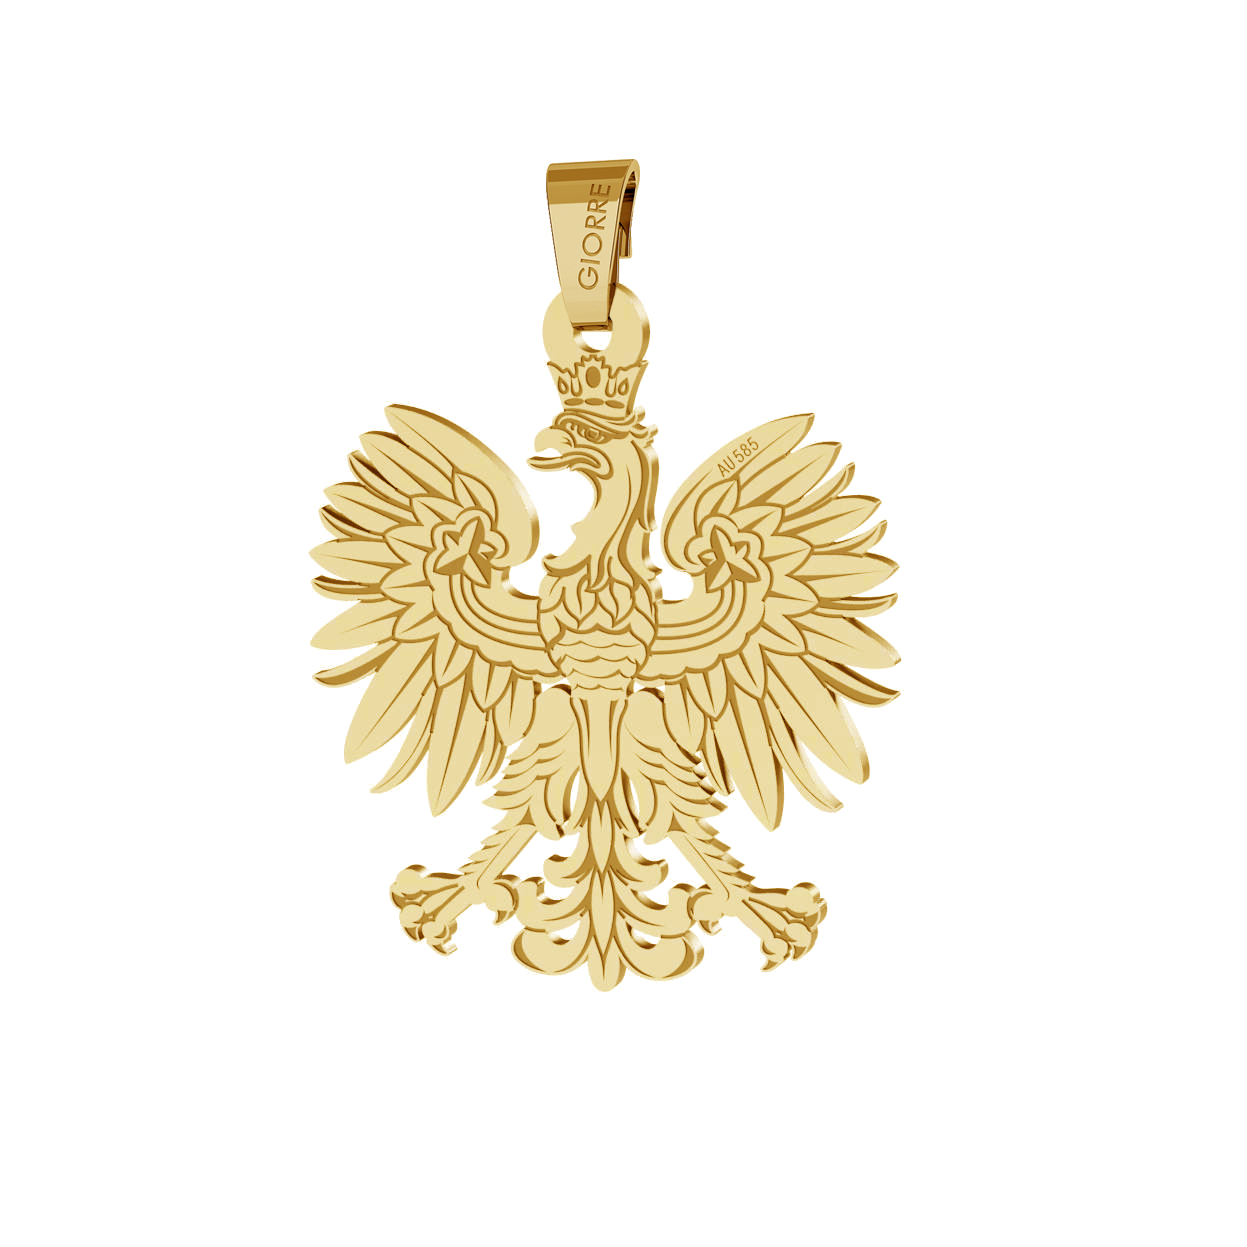 ORO COLGANTE ANGEL, 585